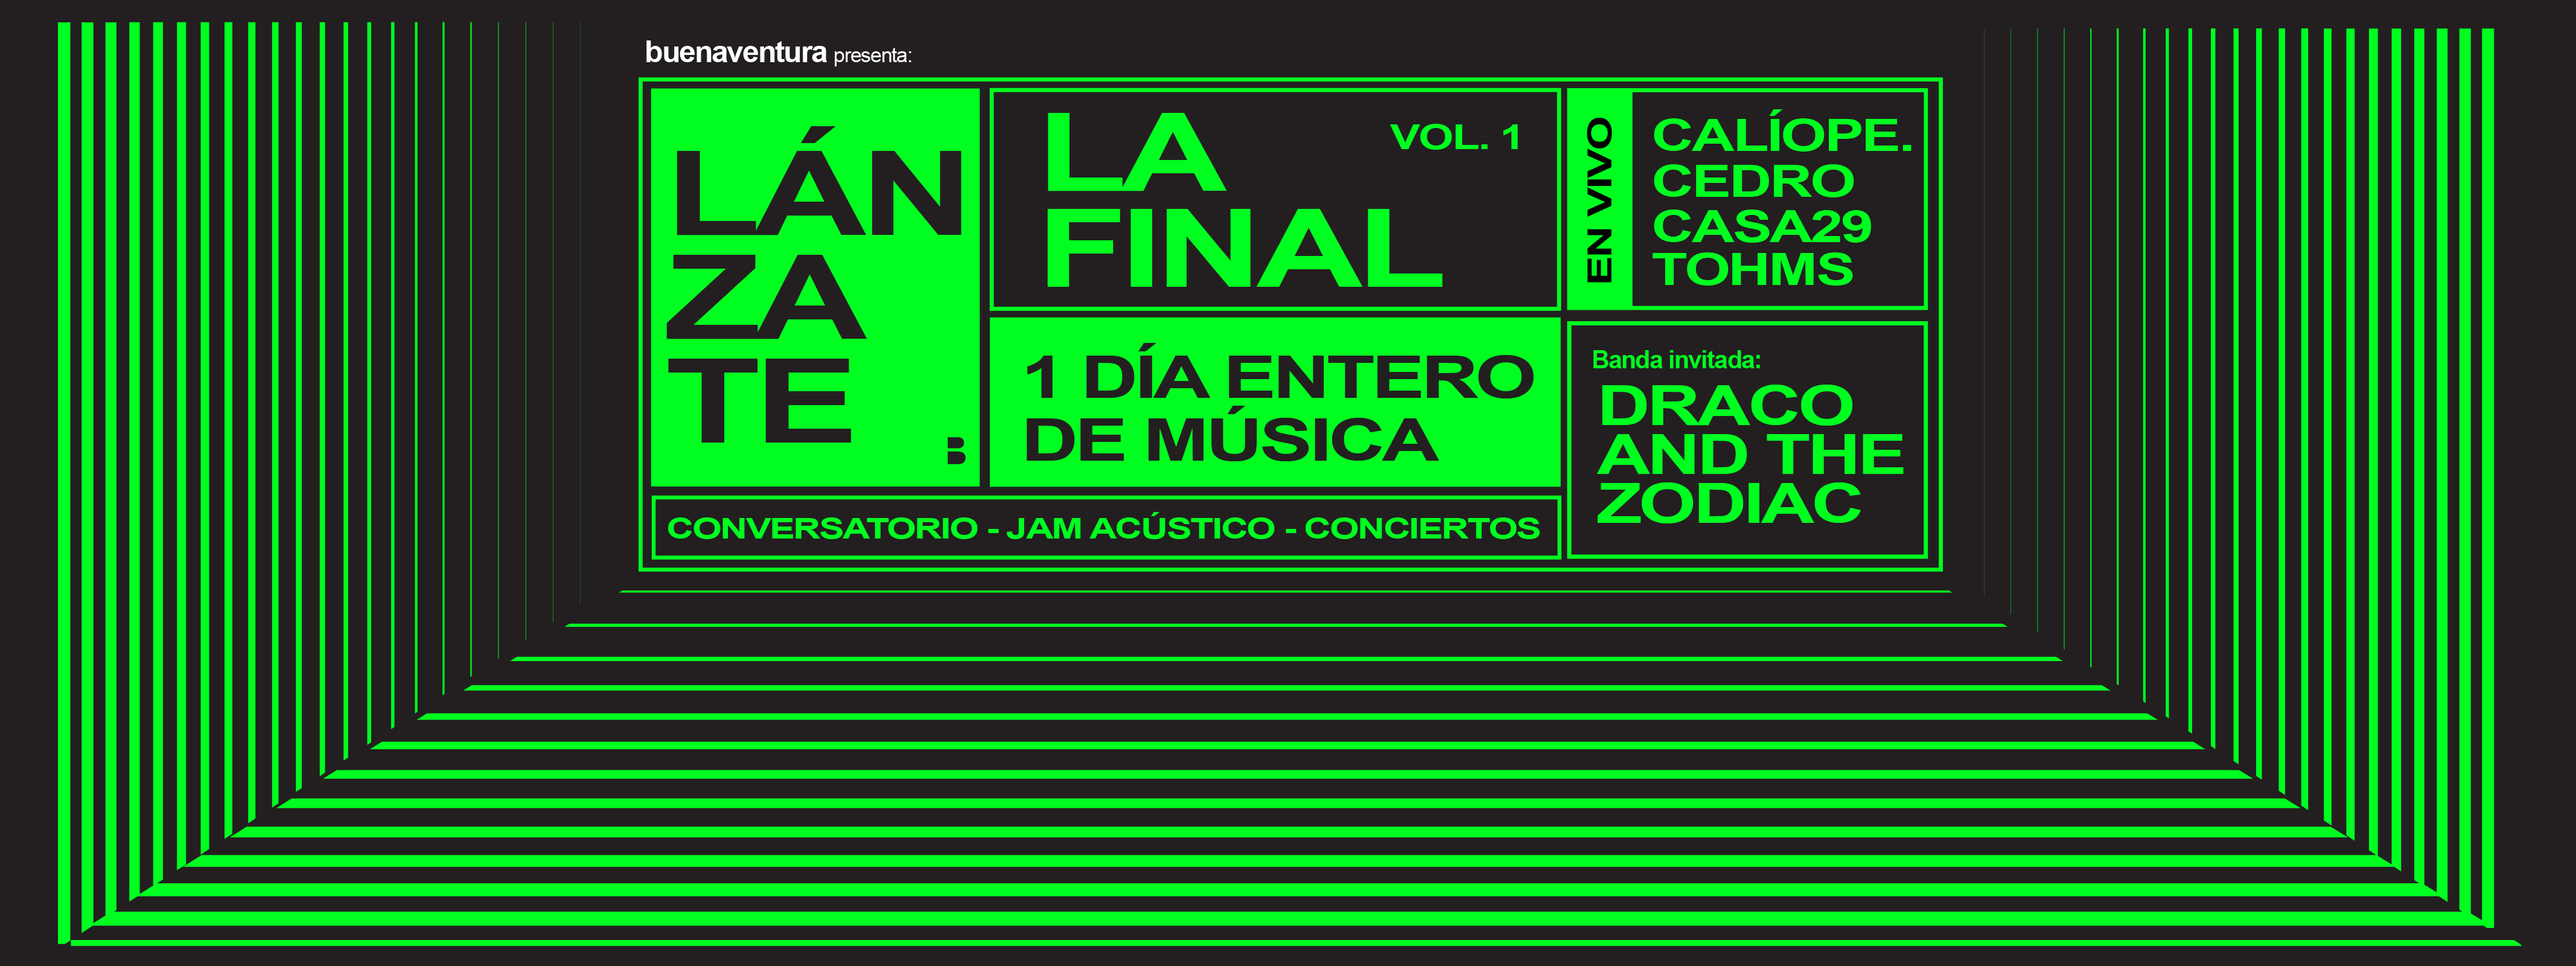 Lánzate Vol.1 La Final! Banda invitada: Draco and the Zodiac. en Quito, BuenPlan